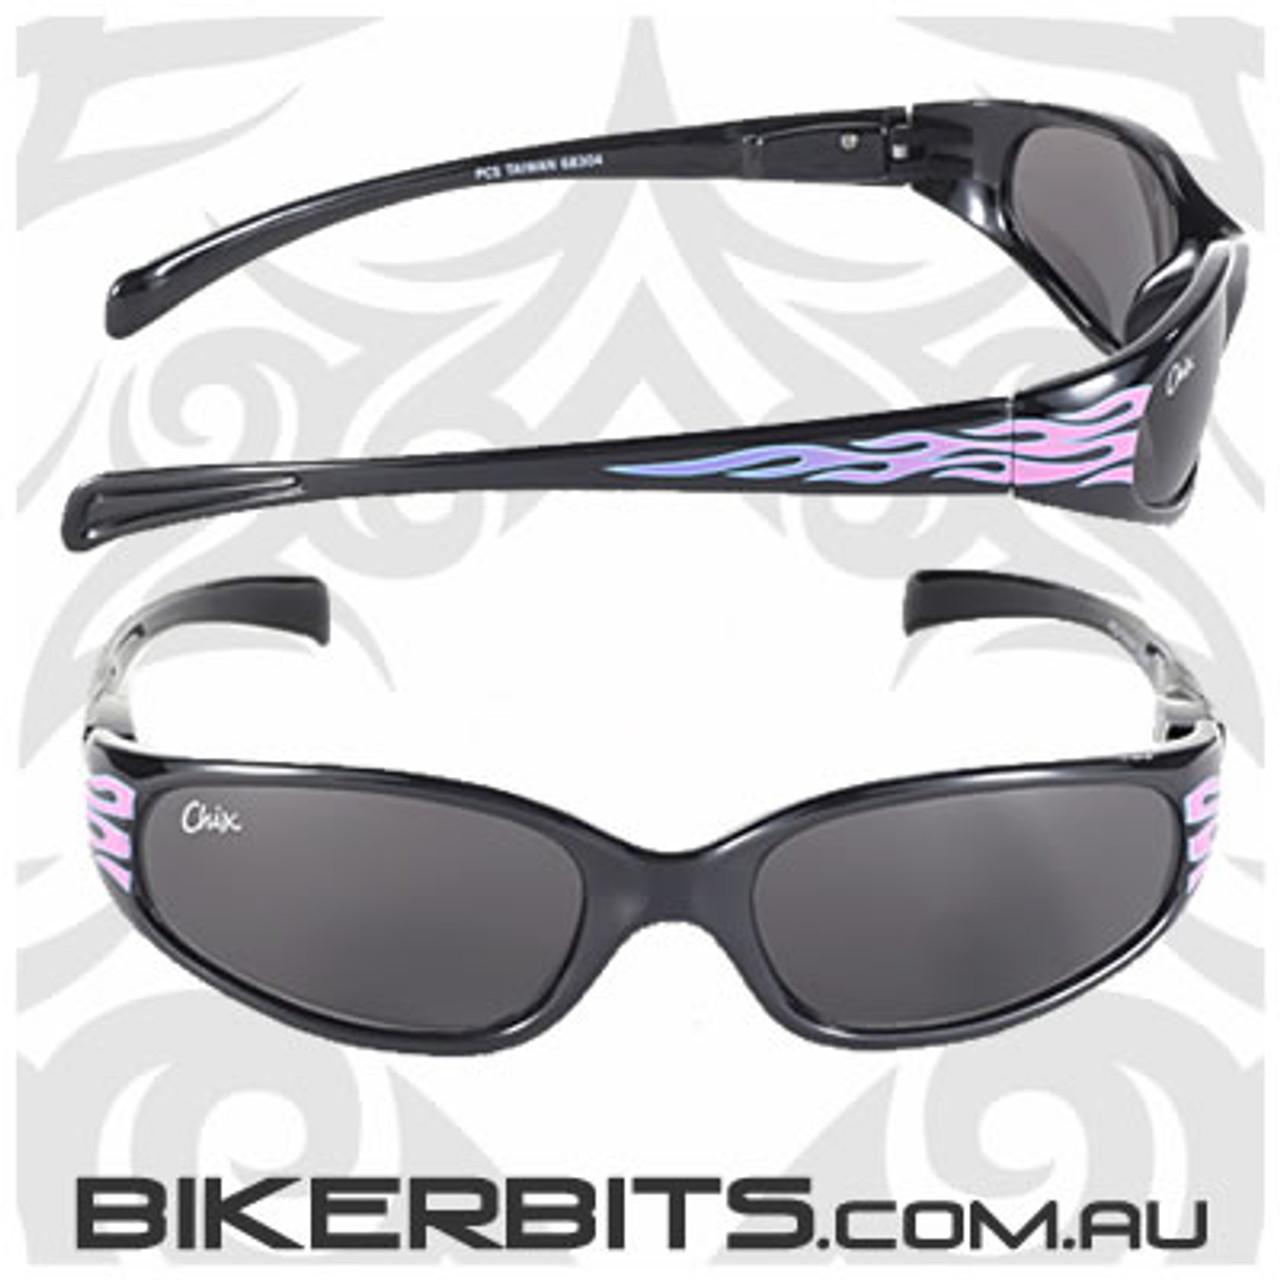 Motorcycle Sunglasses - Chix Heavenly Flame - Smoke/Black